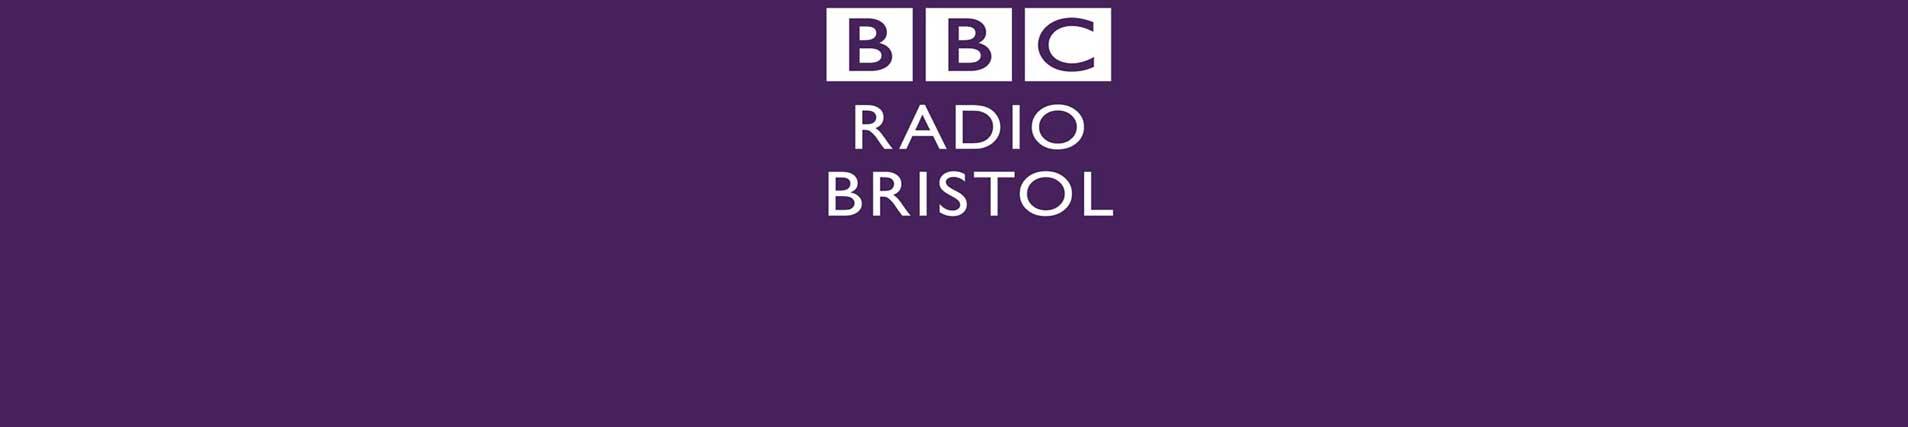 bbc-radio-bristol - with-Emma Britton